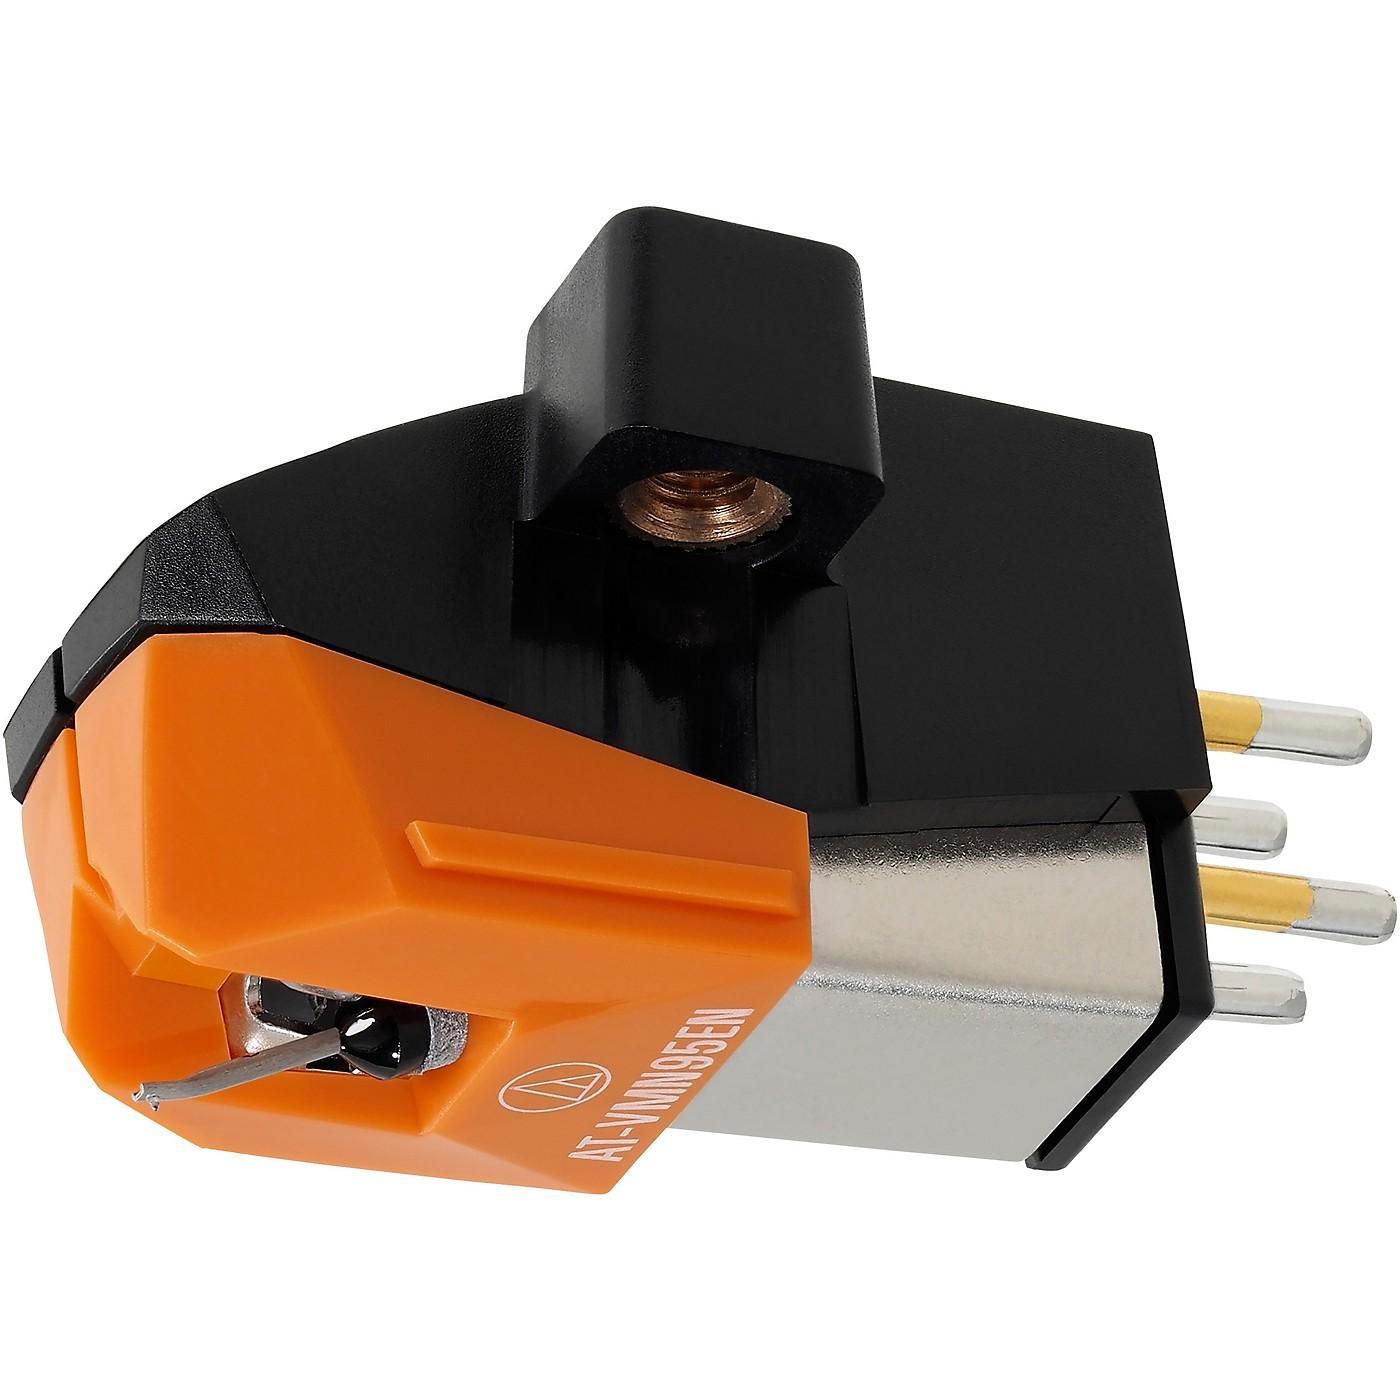 Audio-Technica AT-VM95EN Dual Moving Magnet Cartridge thumbnail